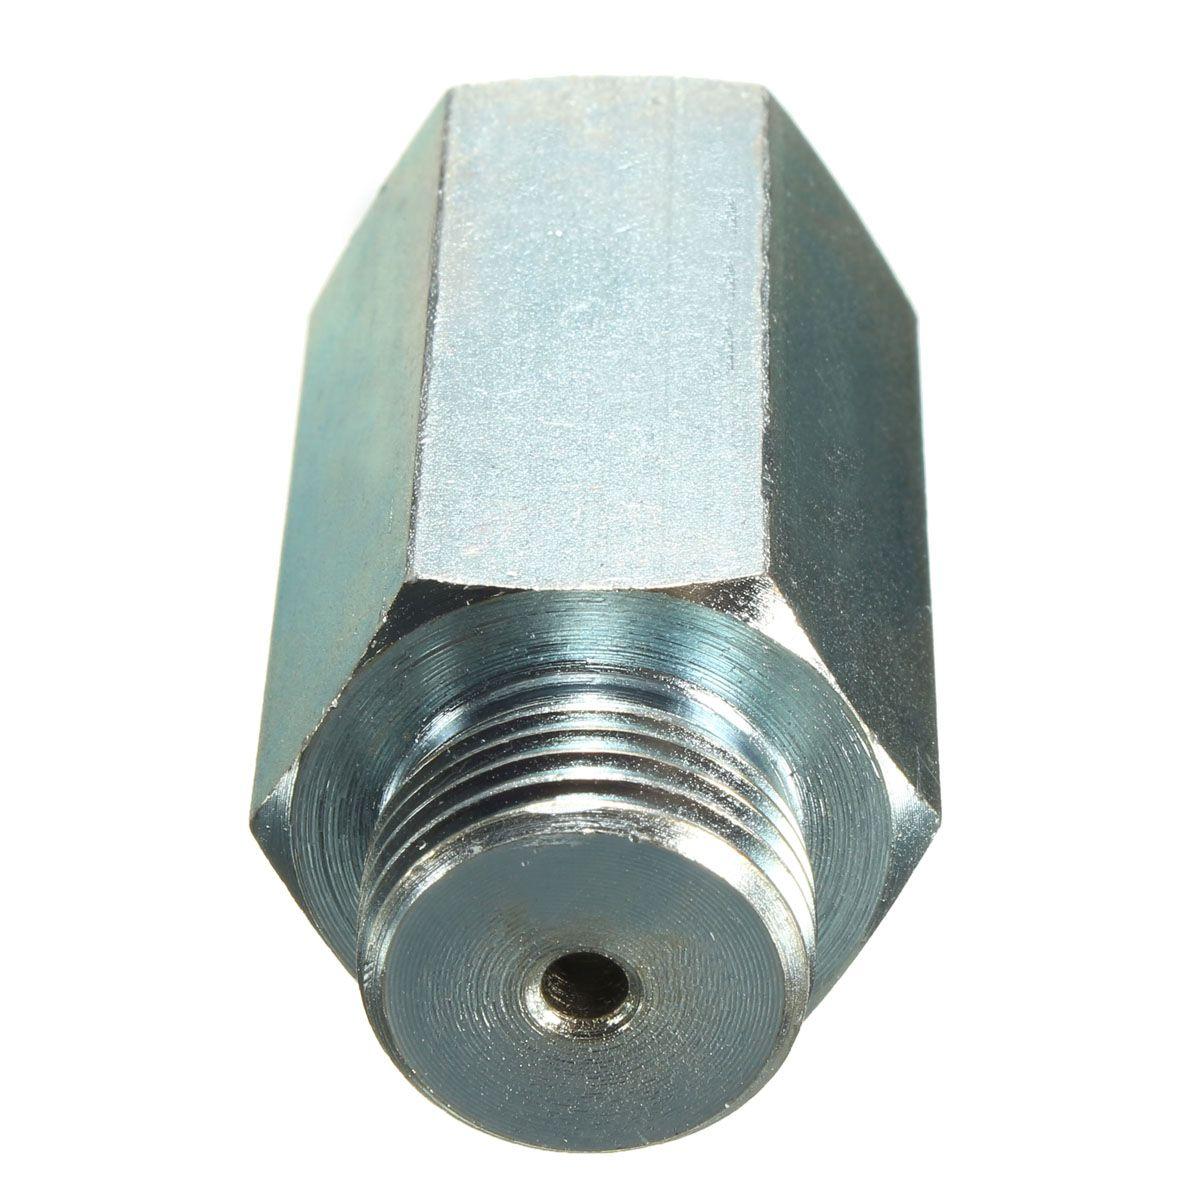 M18x1.5 Oxygen Sensor Extender Spacer Joints Converter for Lambda /decat /hydrogen